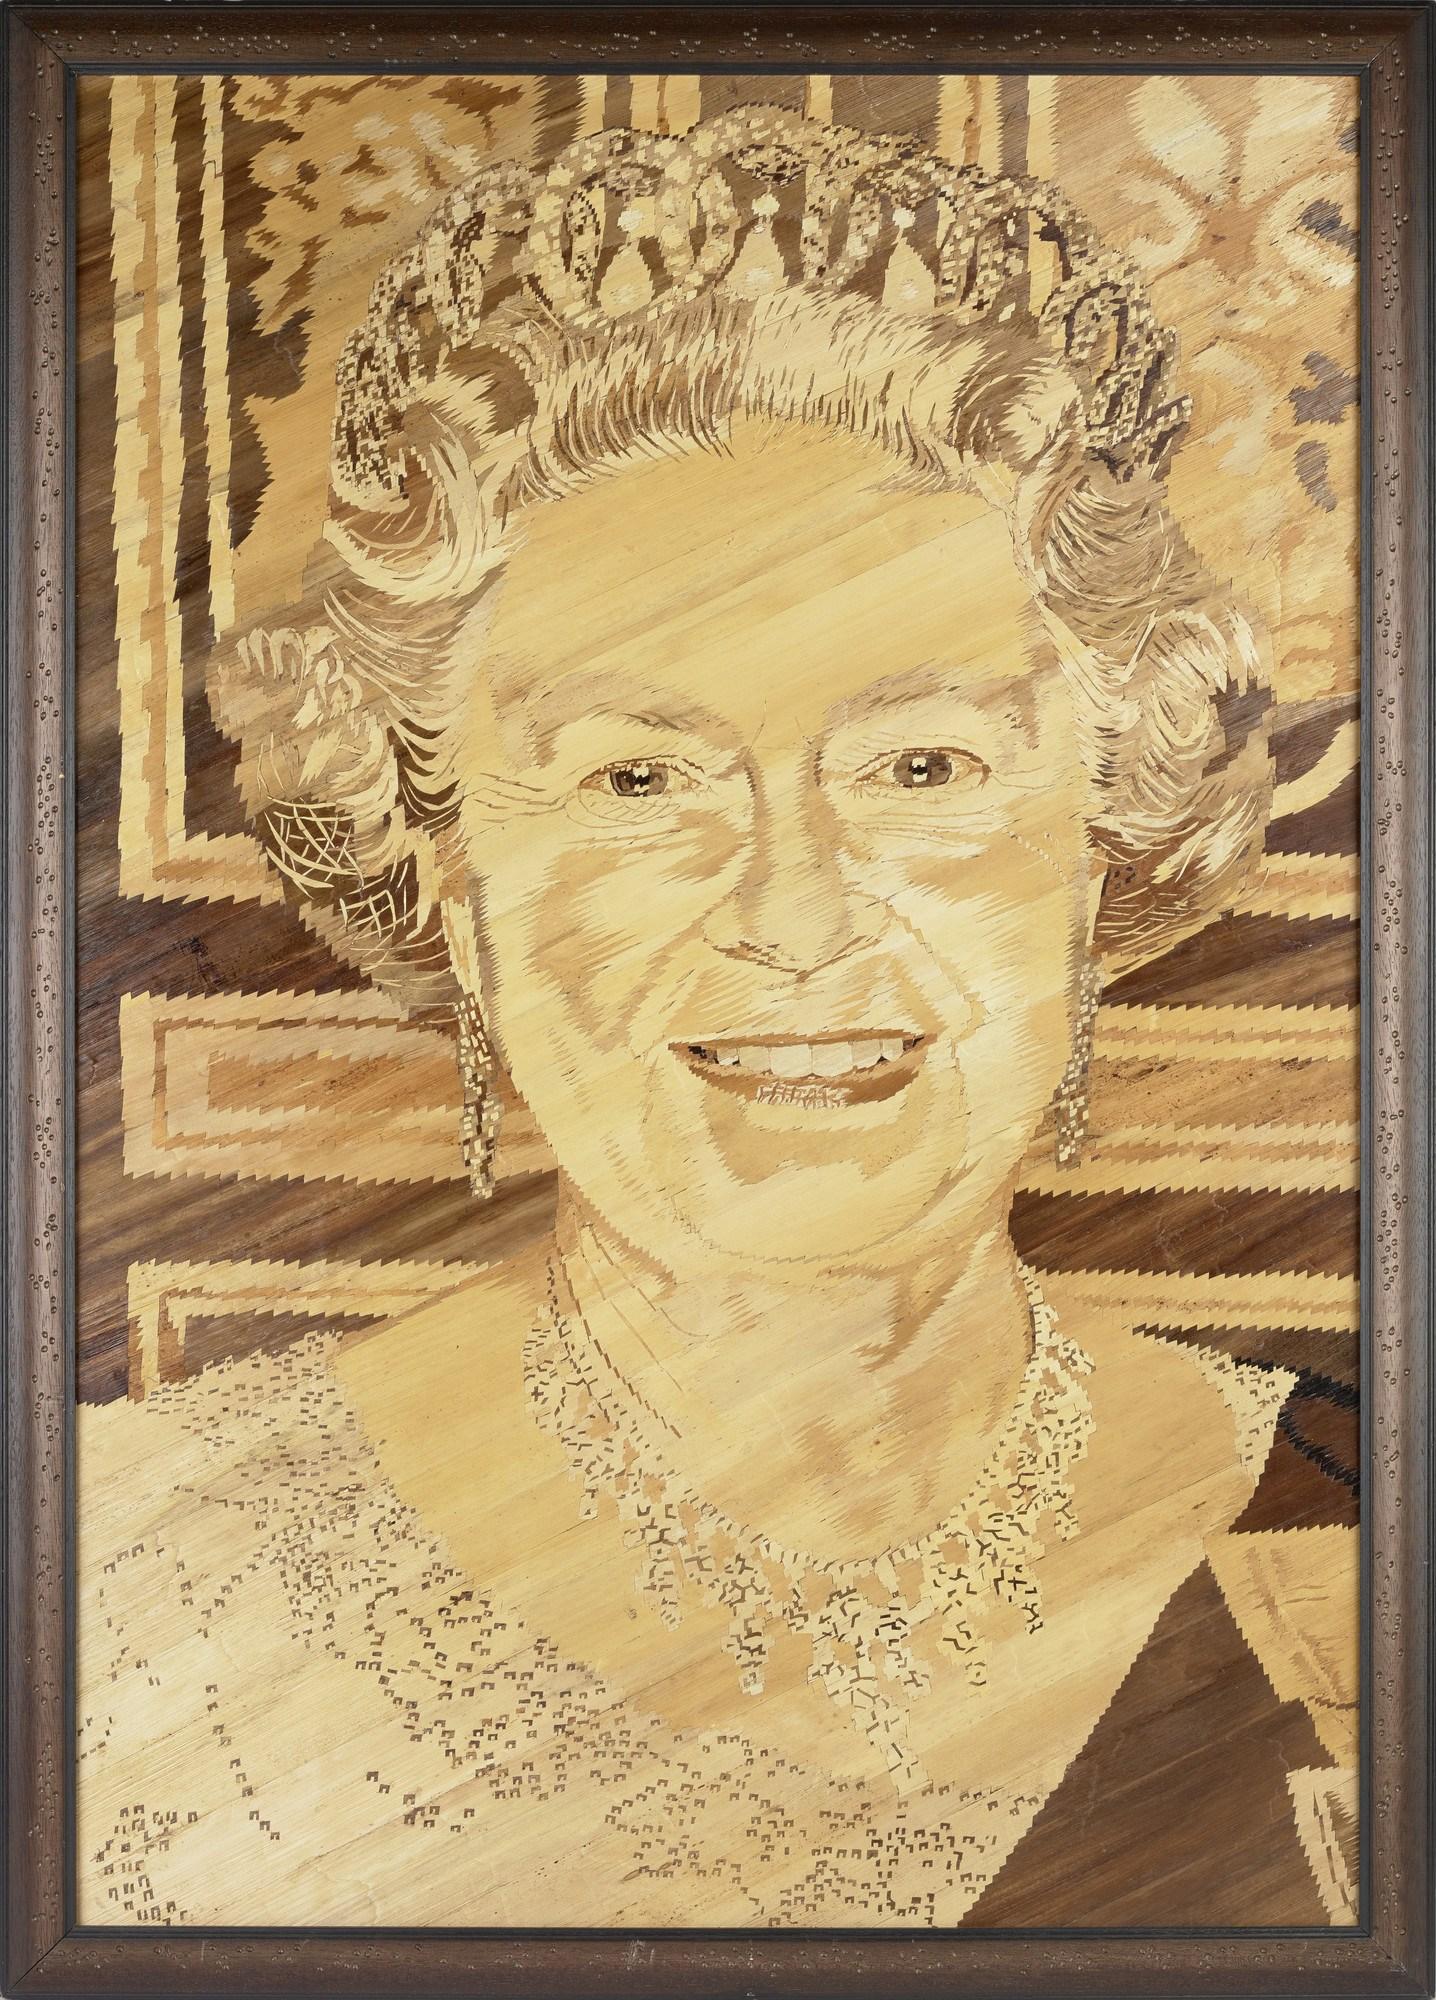 Queen Elizabeth Banana leaf portrait